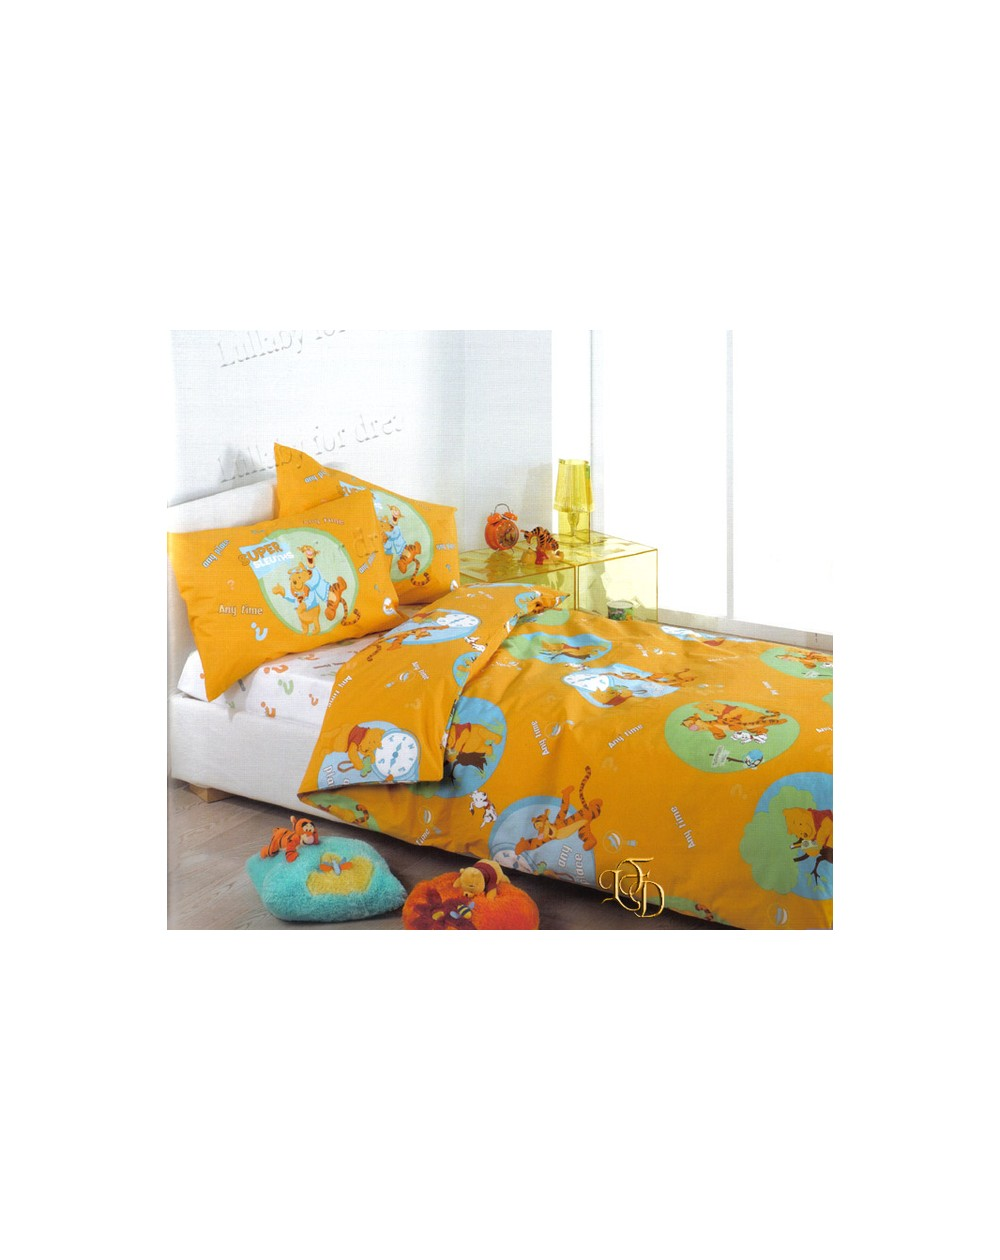 bett 125 cm bettbezug bettlaken kissenbez ge farbe. Black Bedroom Furniture Sets. Home Design Ideas